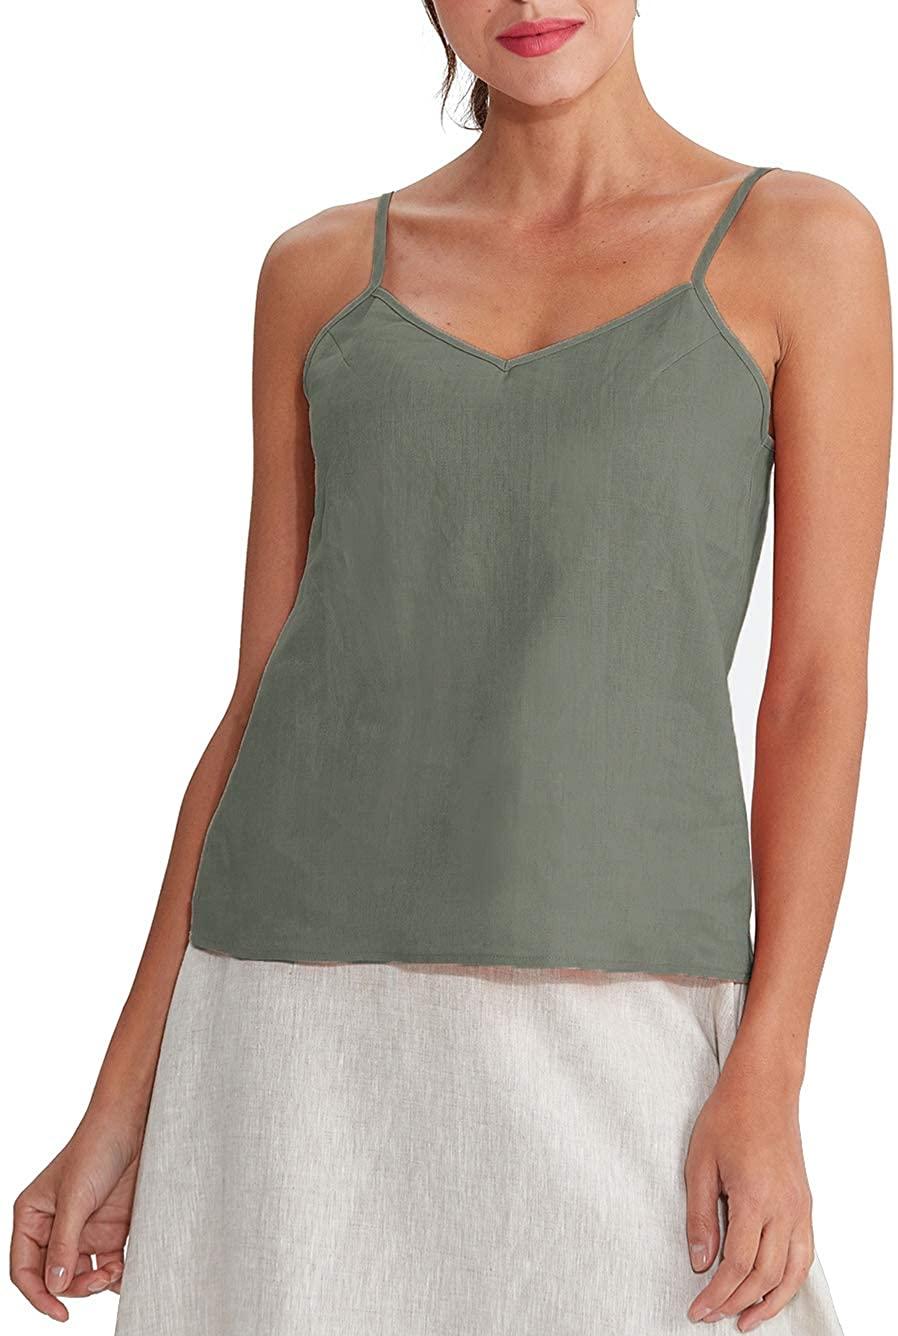 Amazhiyu Women's Linen Camisole Tank Top V-Neck Loose Casual Adjustable Strap Tops